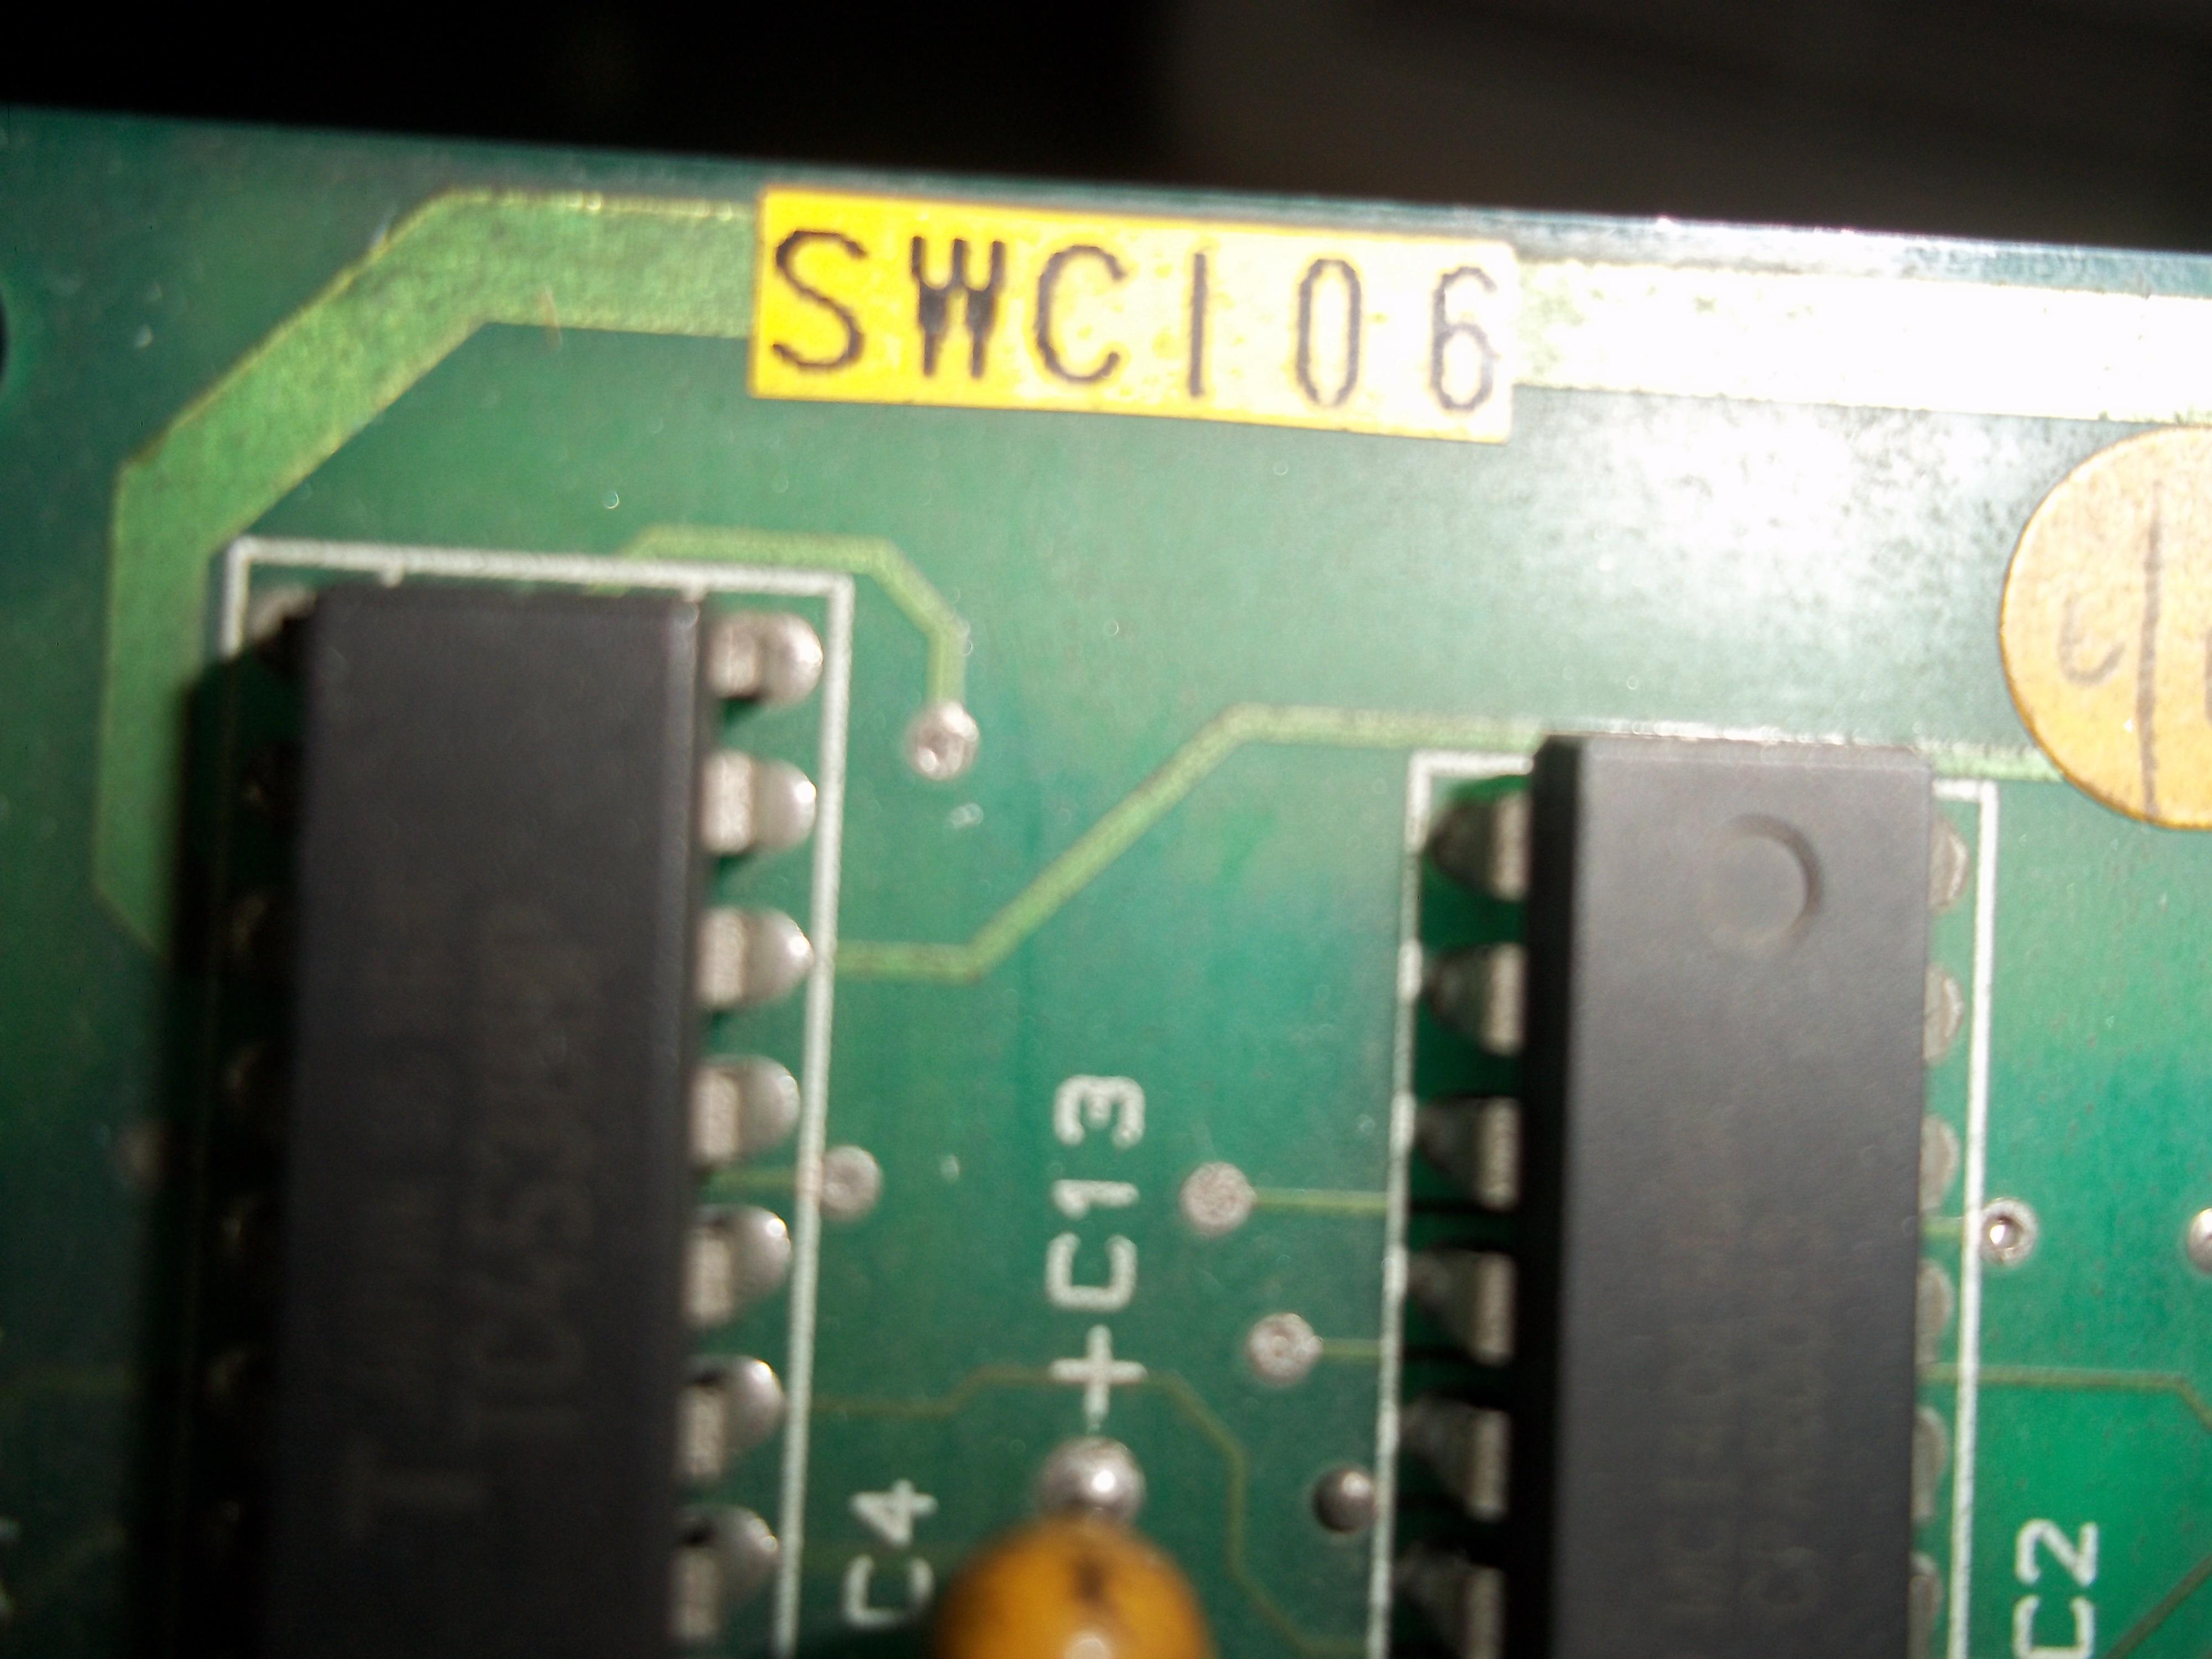 Repair SWC-106 OMRON PCB BOARD WELDING in Malaysia, Singapore, Thailand, Indonesia